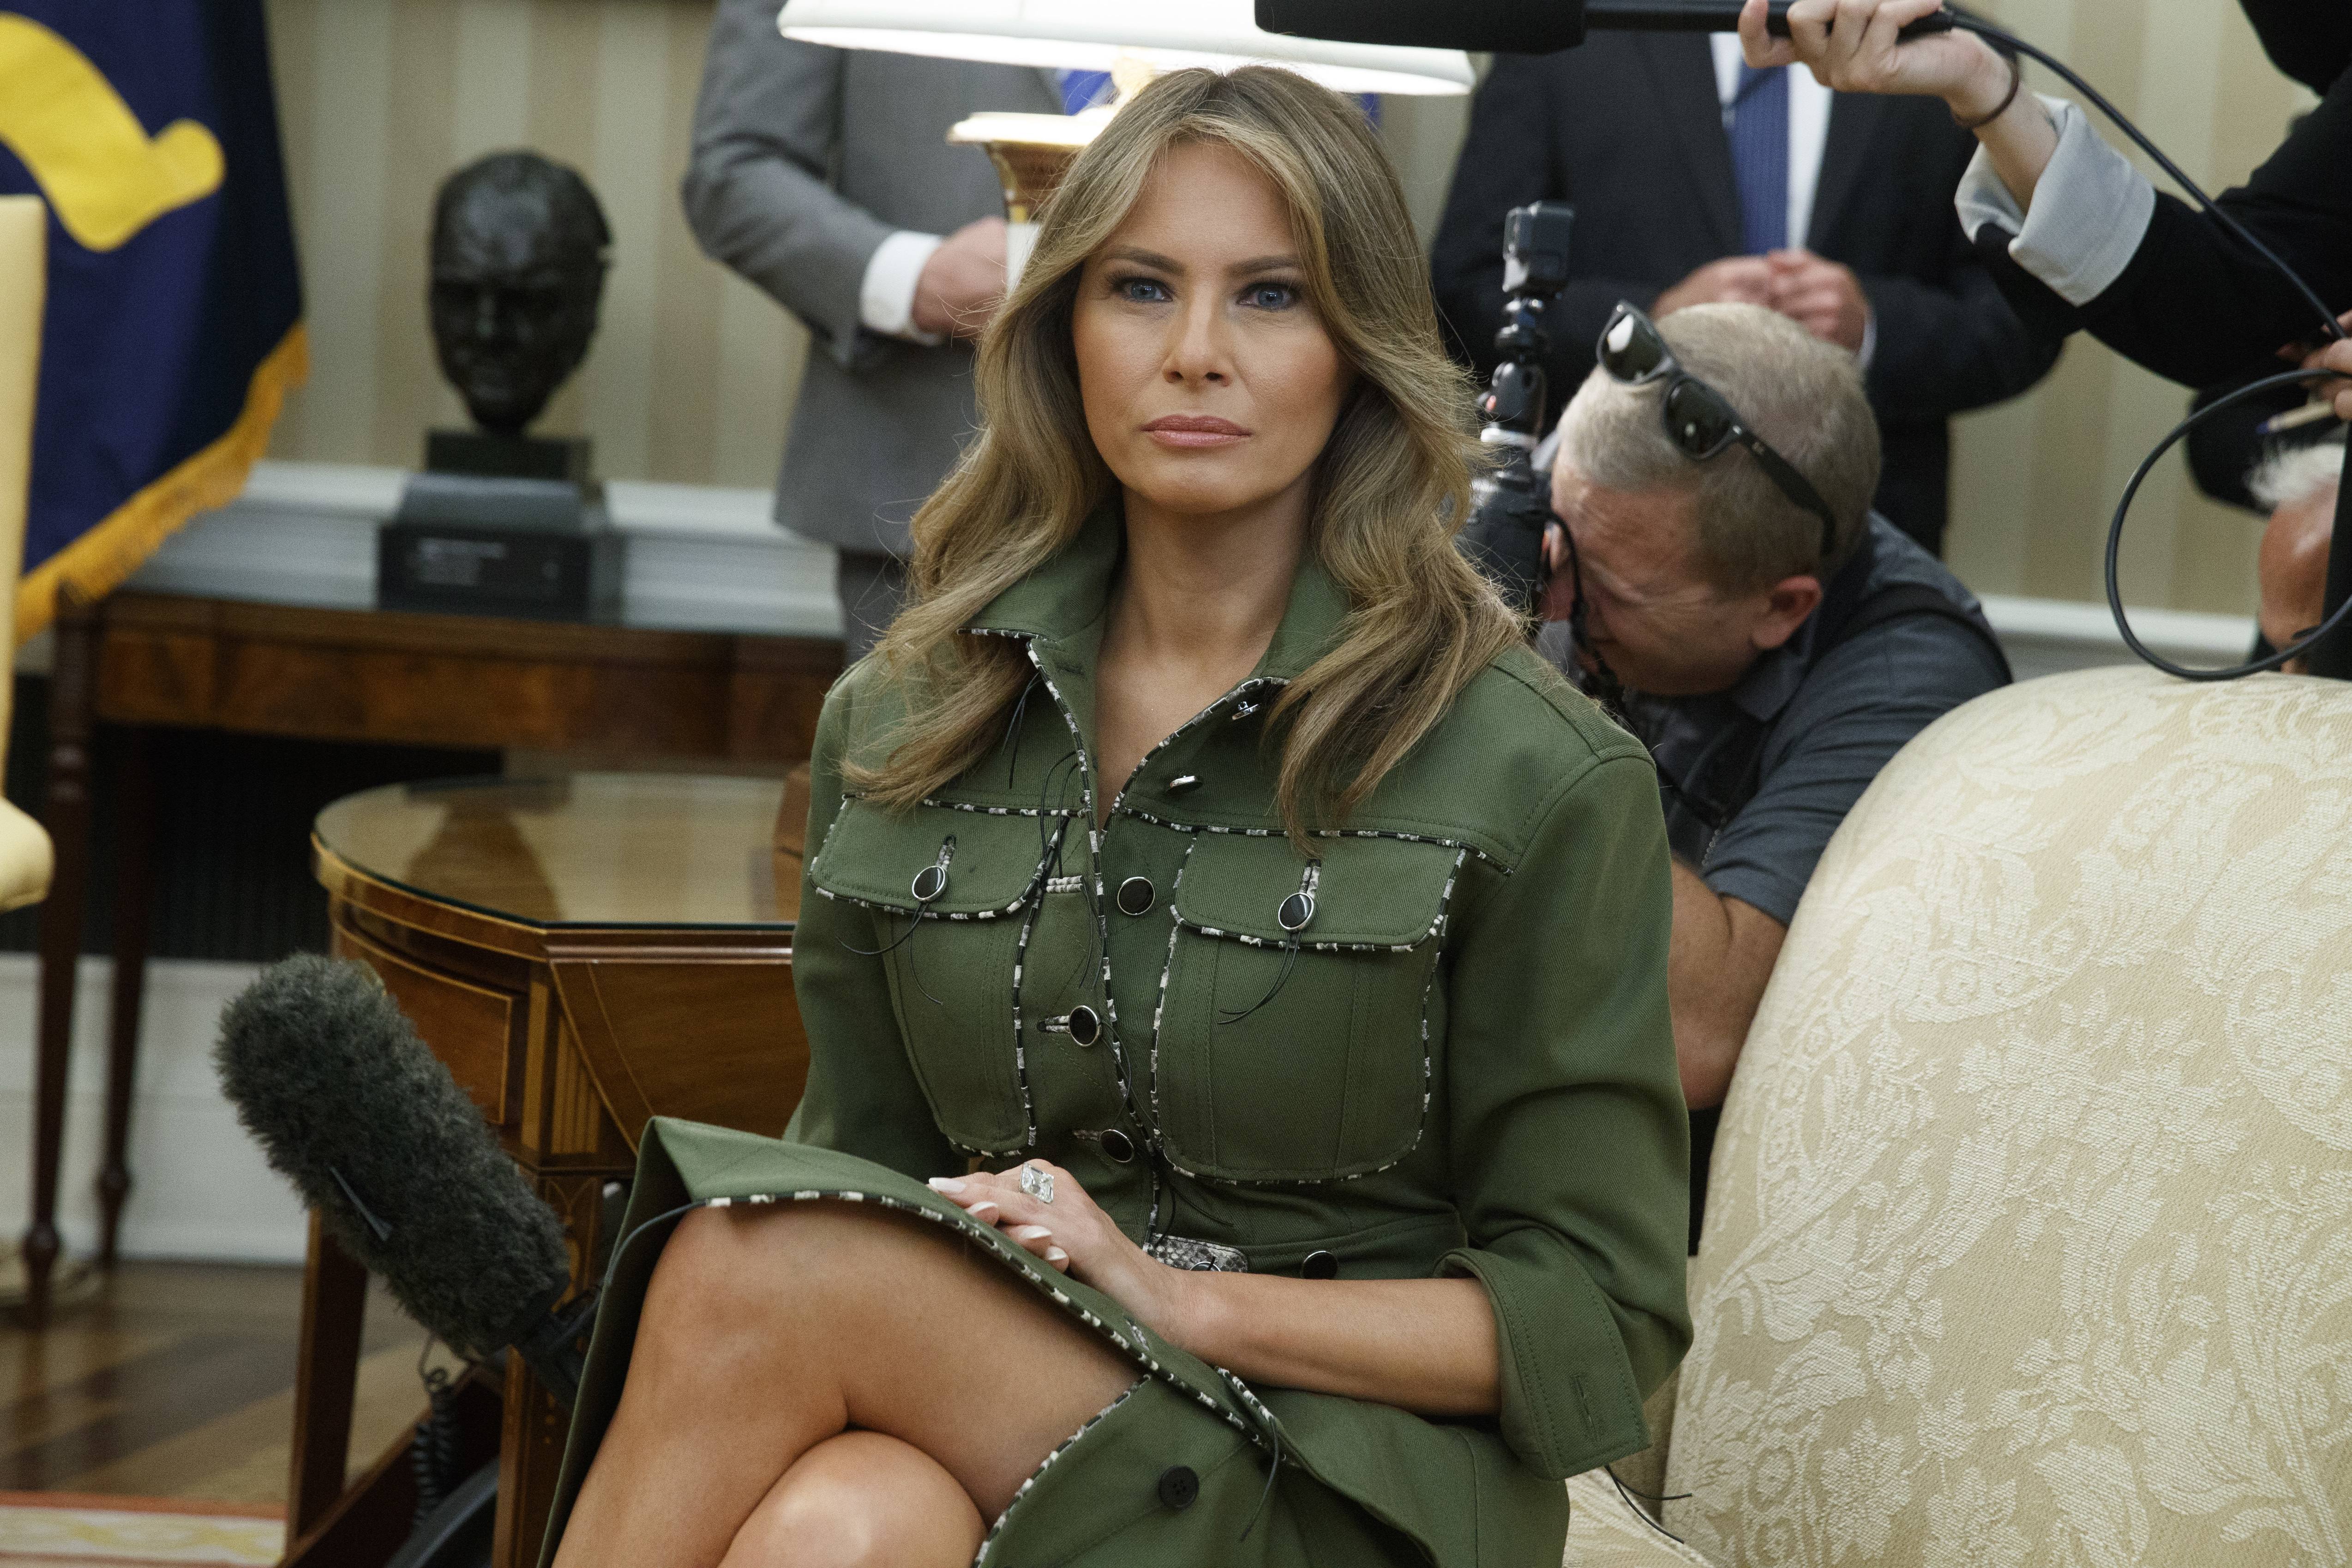 Pamela Anderson Praises Melania Trumps Beauty And Grace After